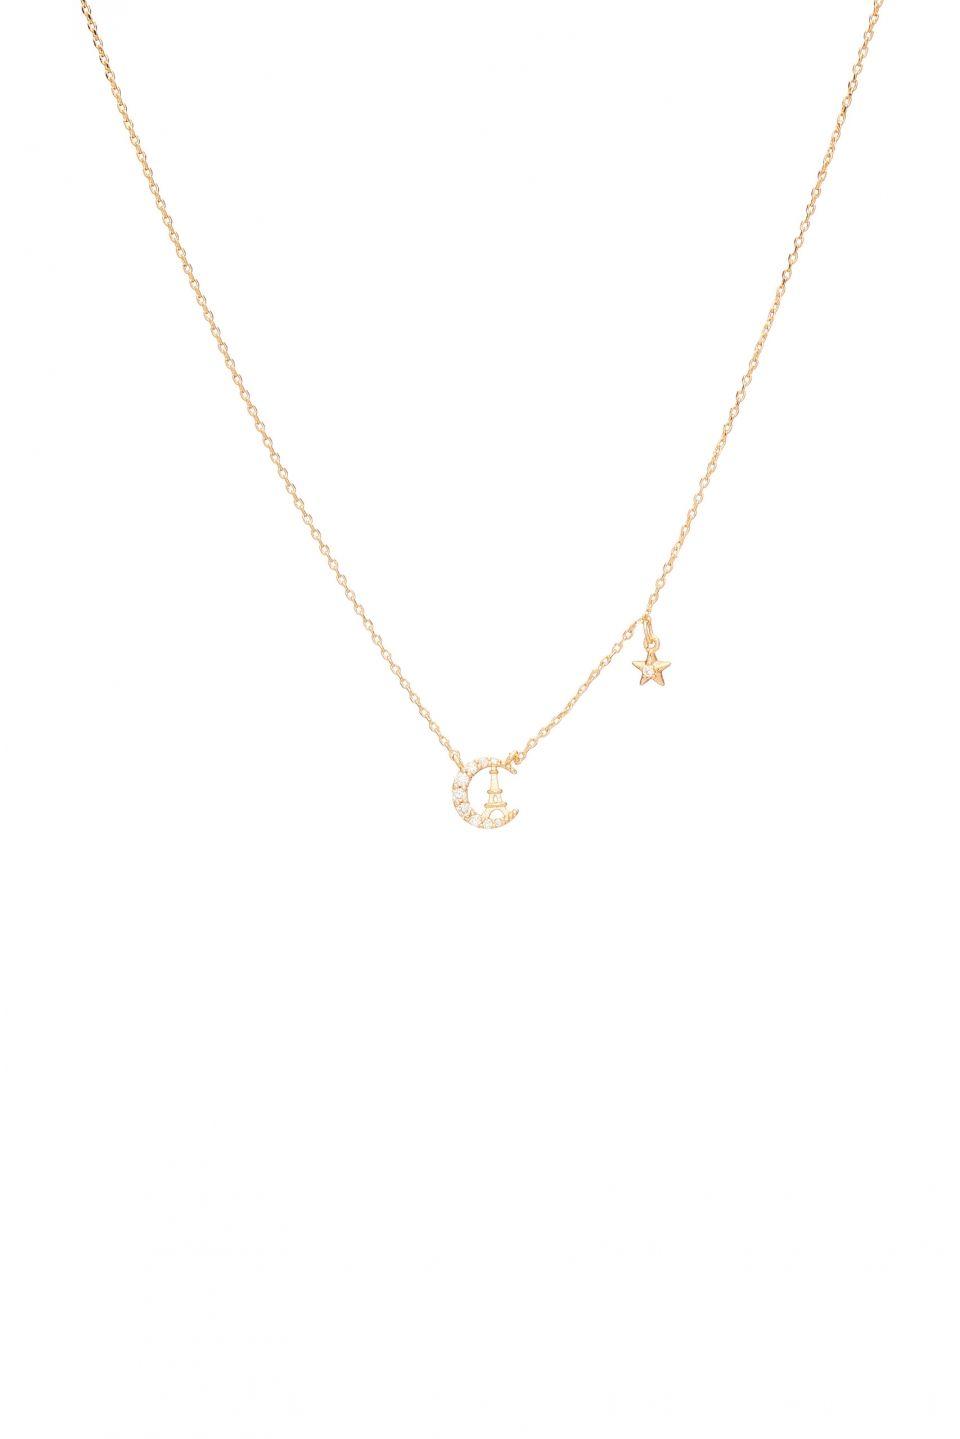 61c968f8e20f2b Rue Gembon Estelle Crescent Moon Eiffel Tower Necklace | Delicate ...